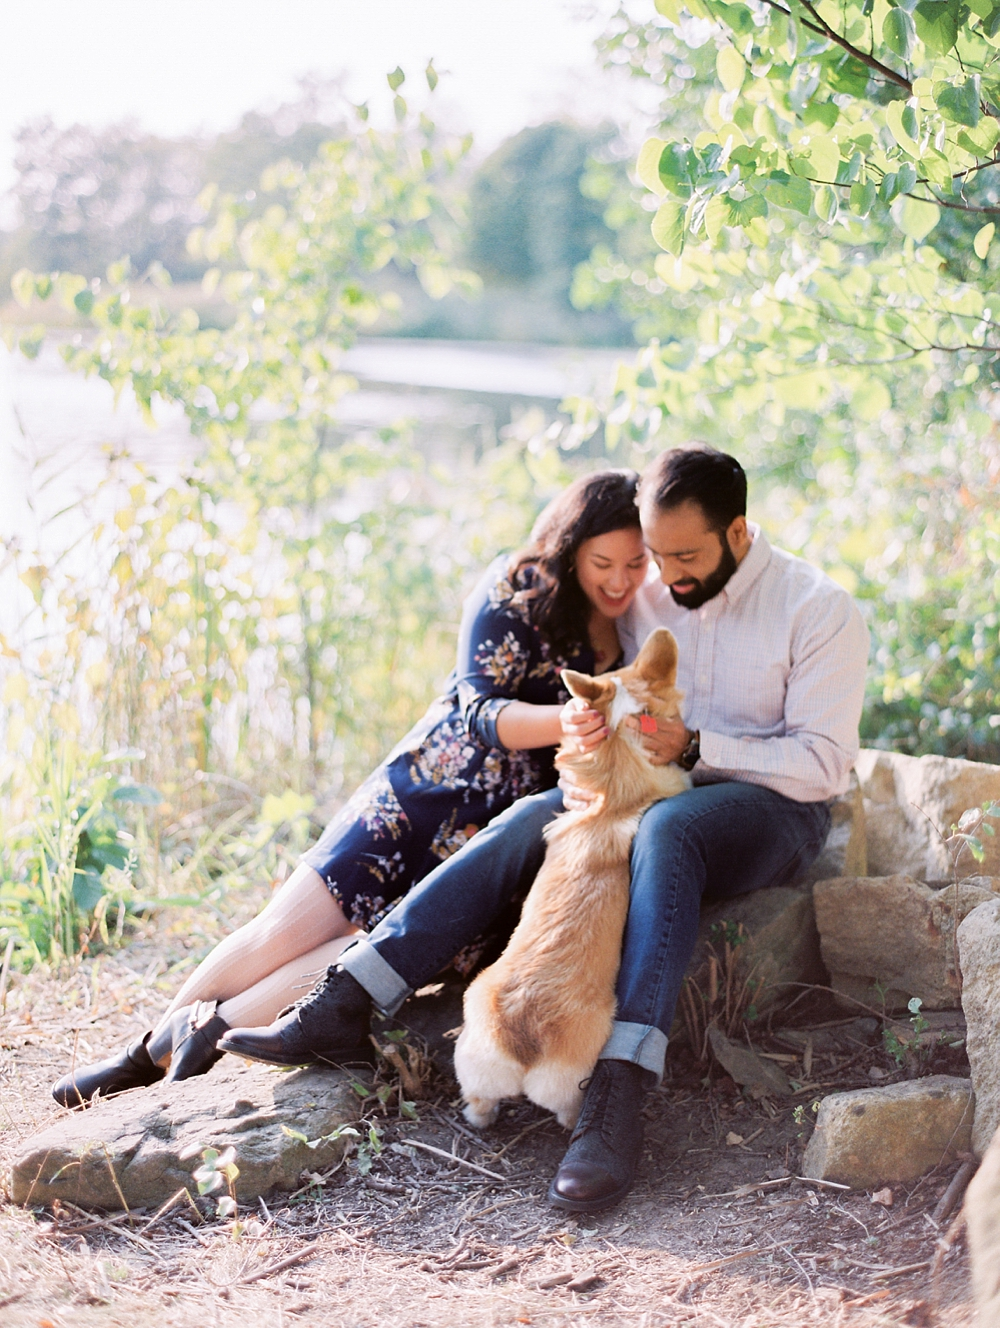 kristin-la-voie-photography-lake-katherine-chicago-wedding-photographer-73